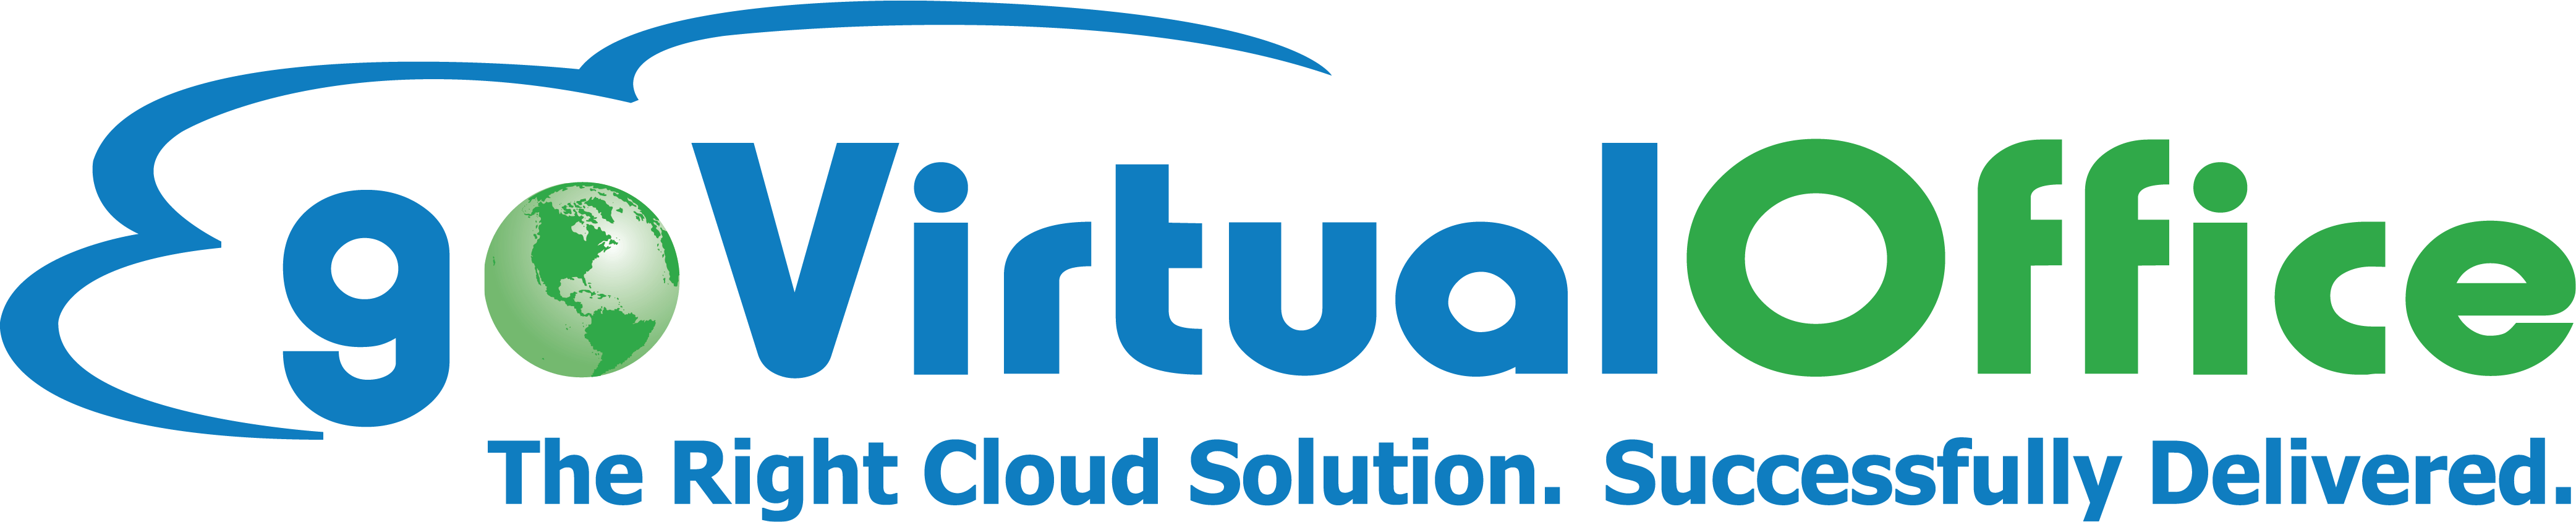 GoVirtualOffice logo